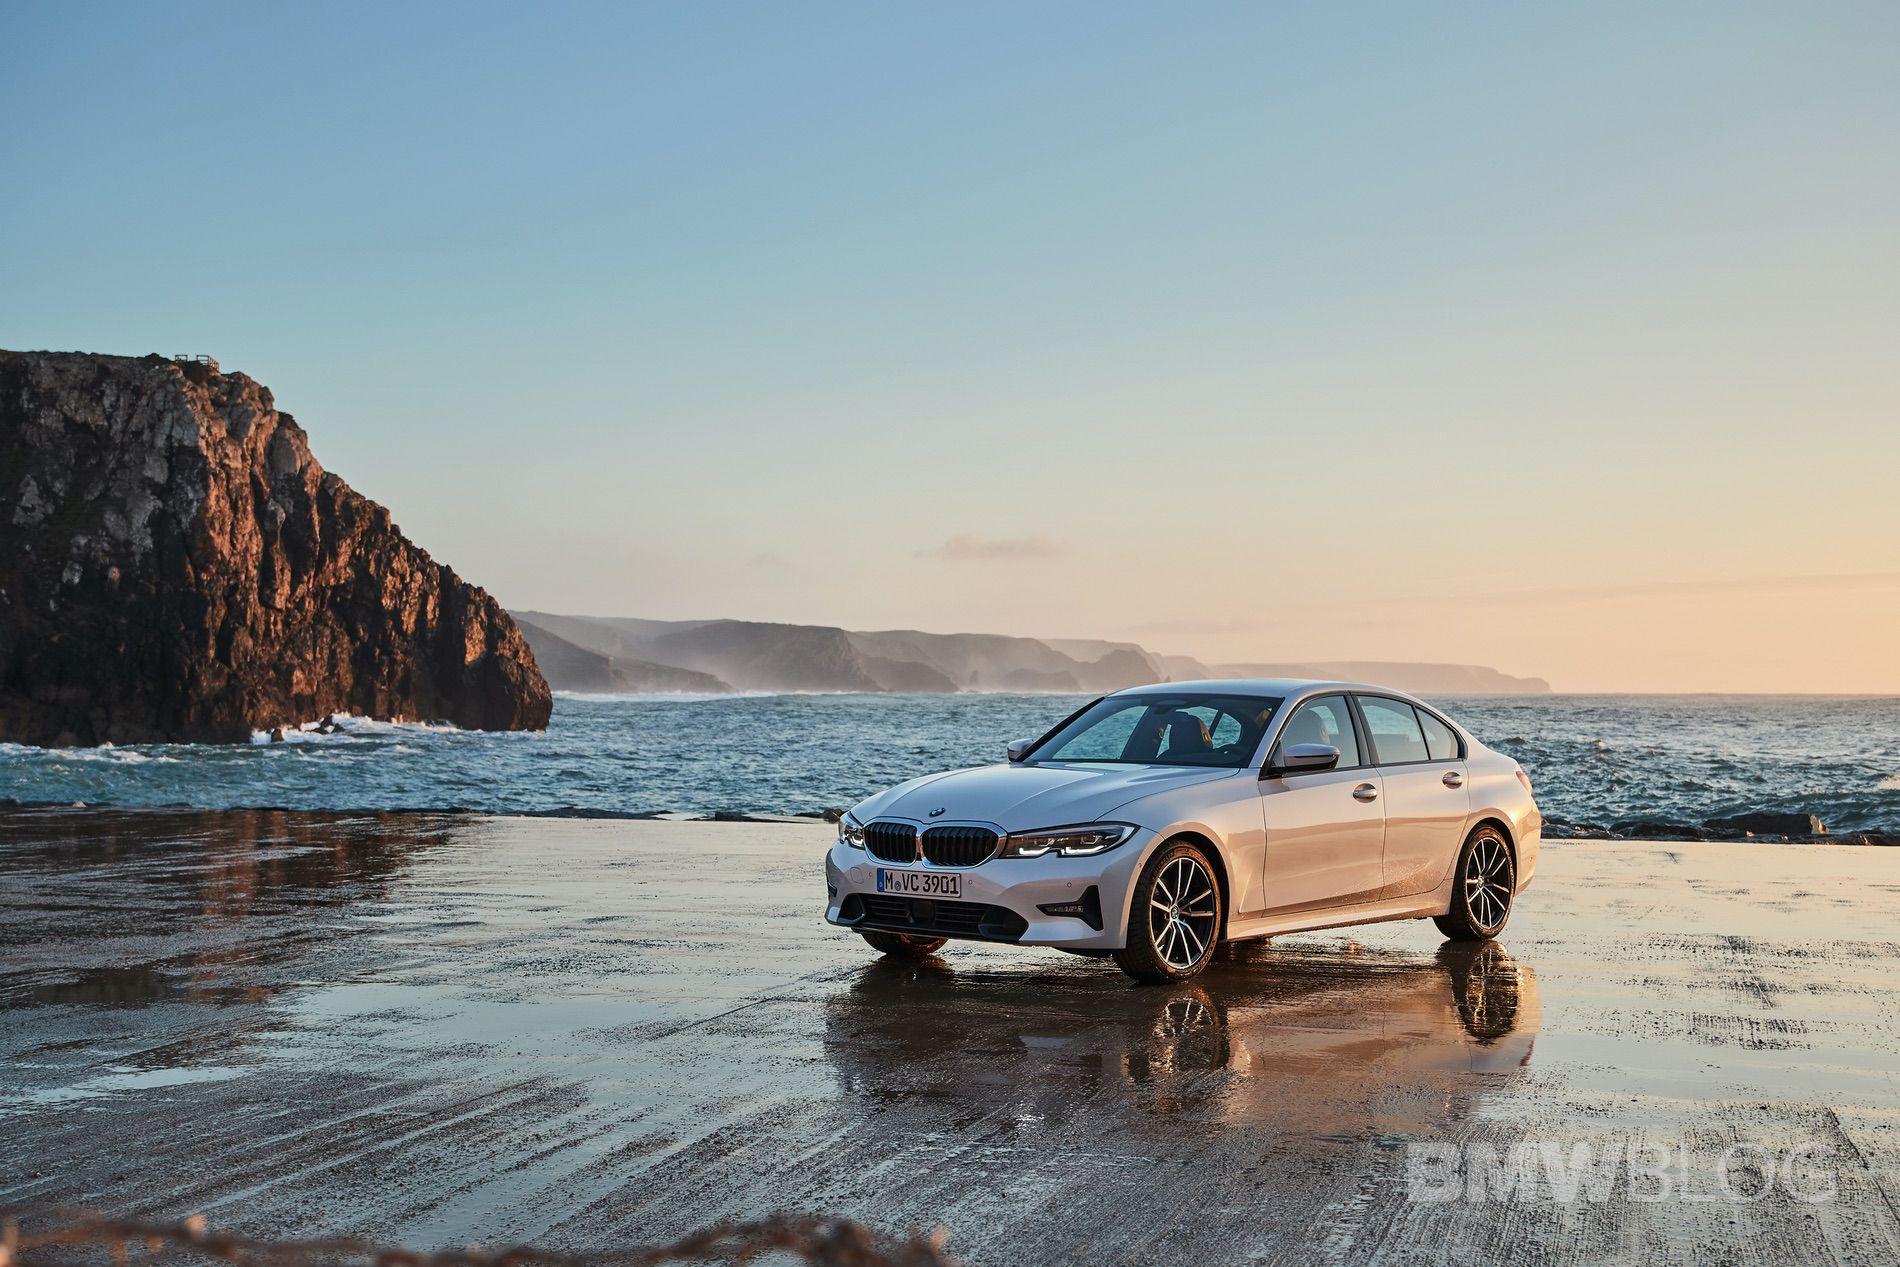 2019 BMW 320d G20 test drive 29